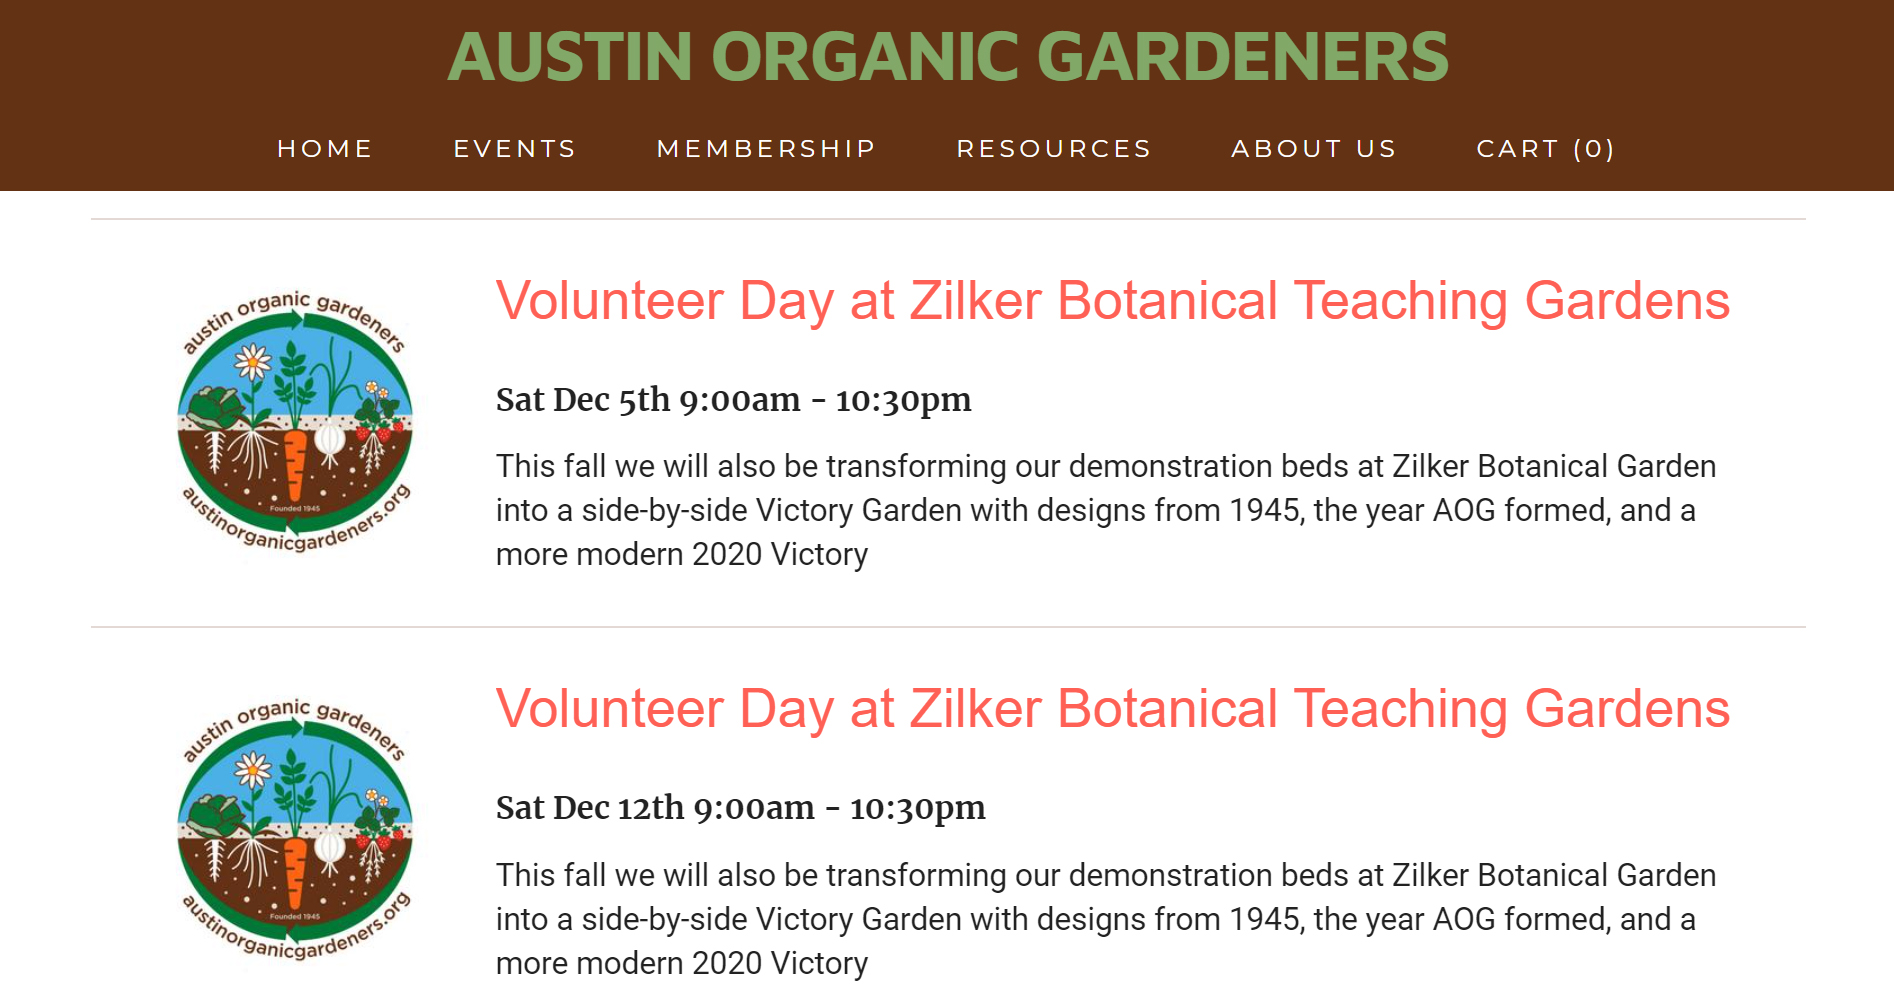 Austin Organic Gardeners website